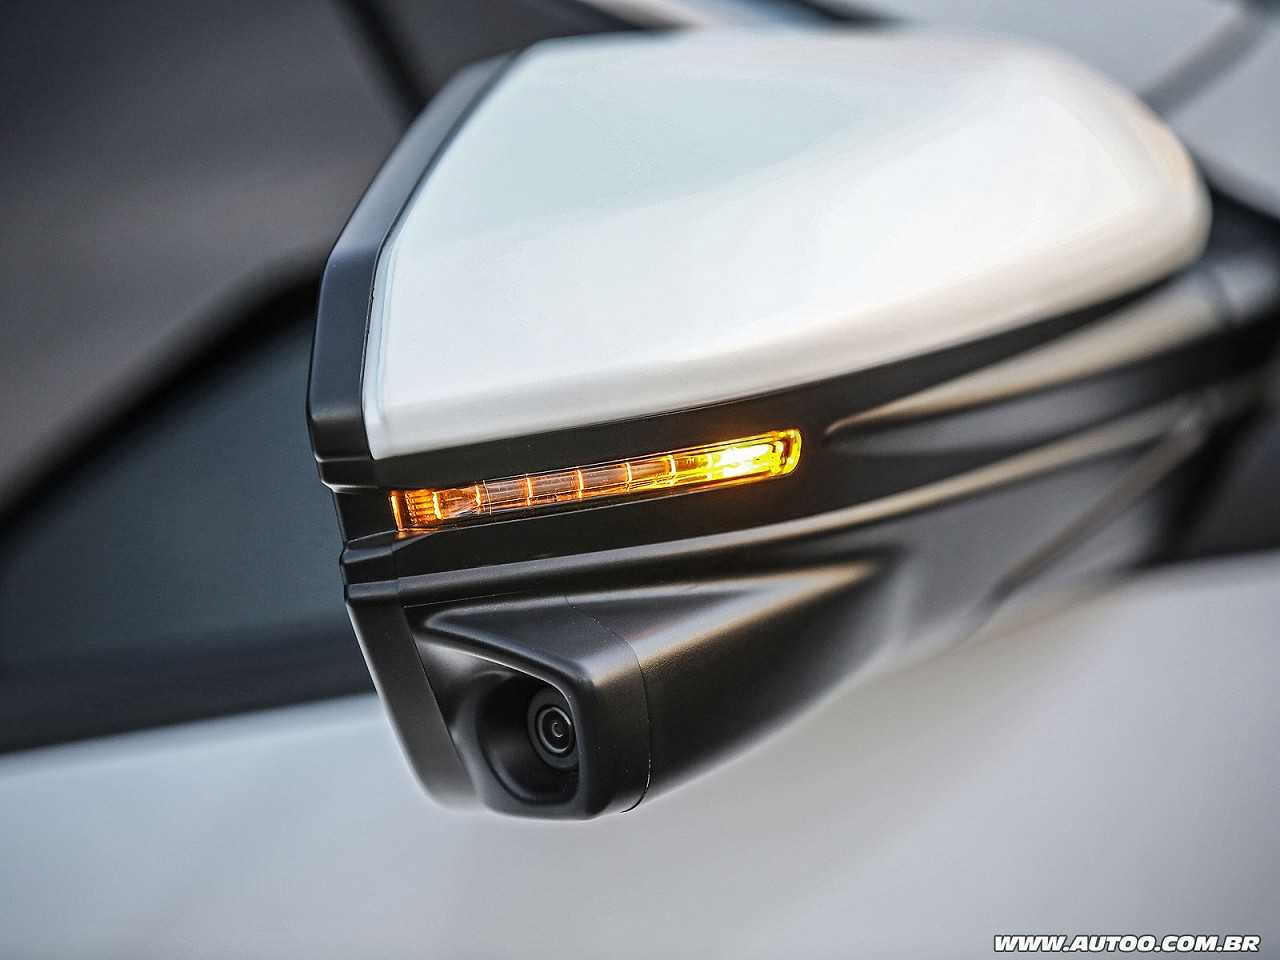 HondaCivic 2017 - retrovisores